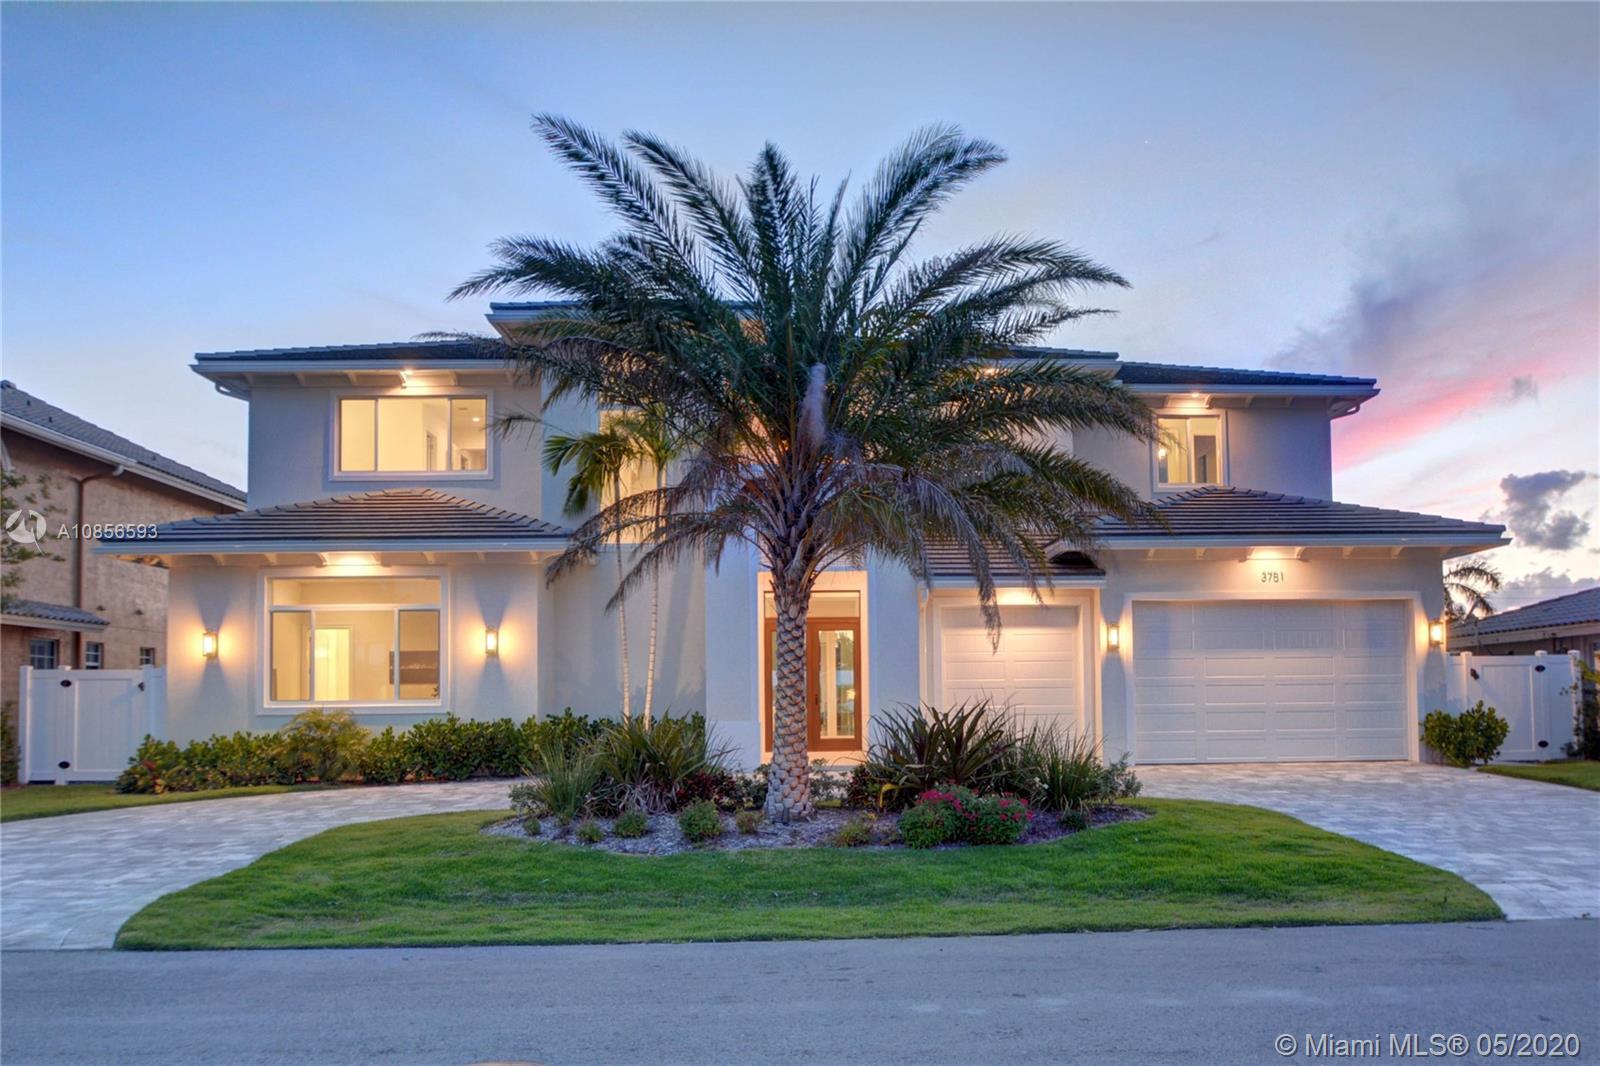 image #1 of property, Venetian Isles 1st Sec